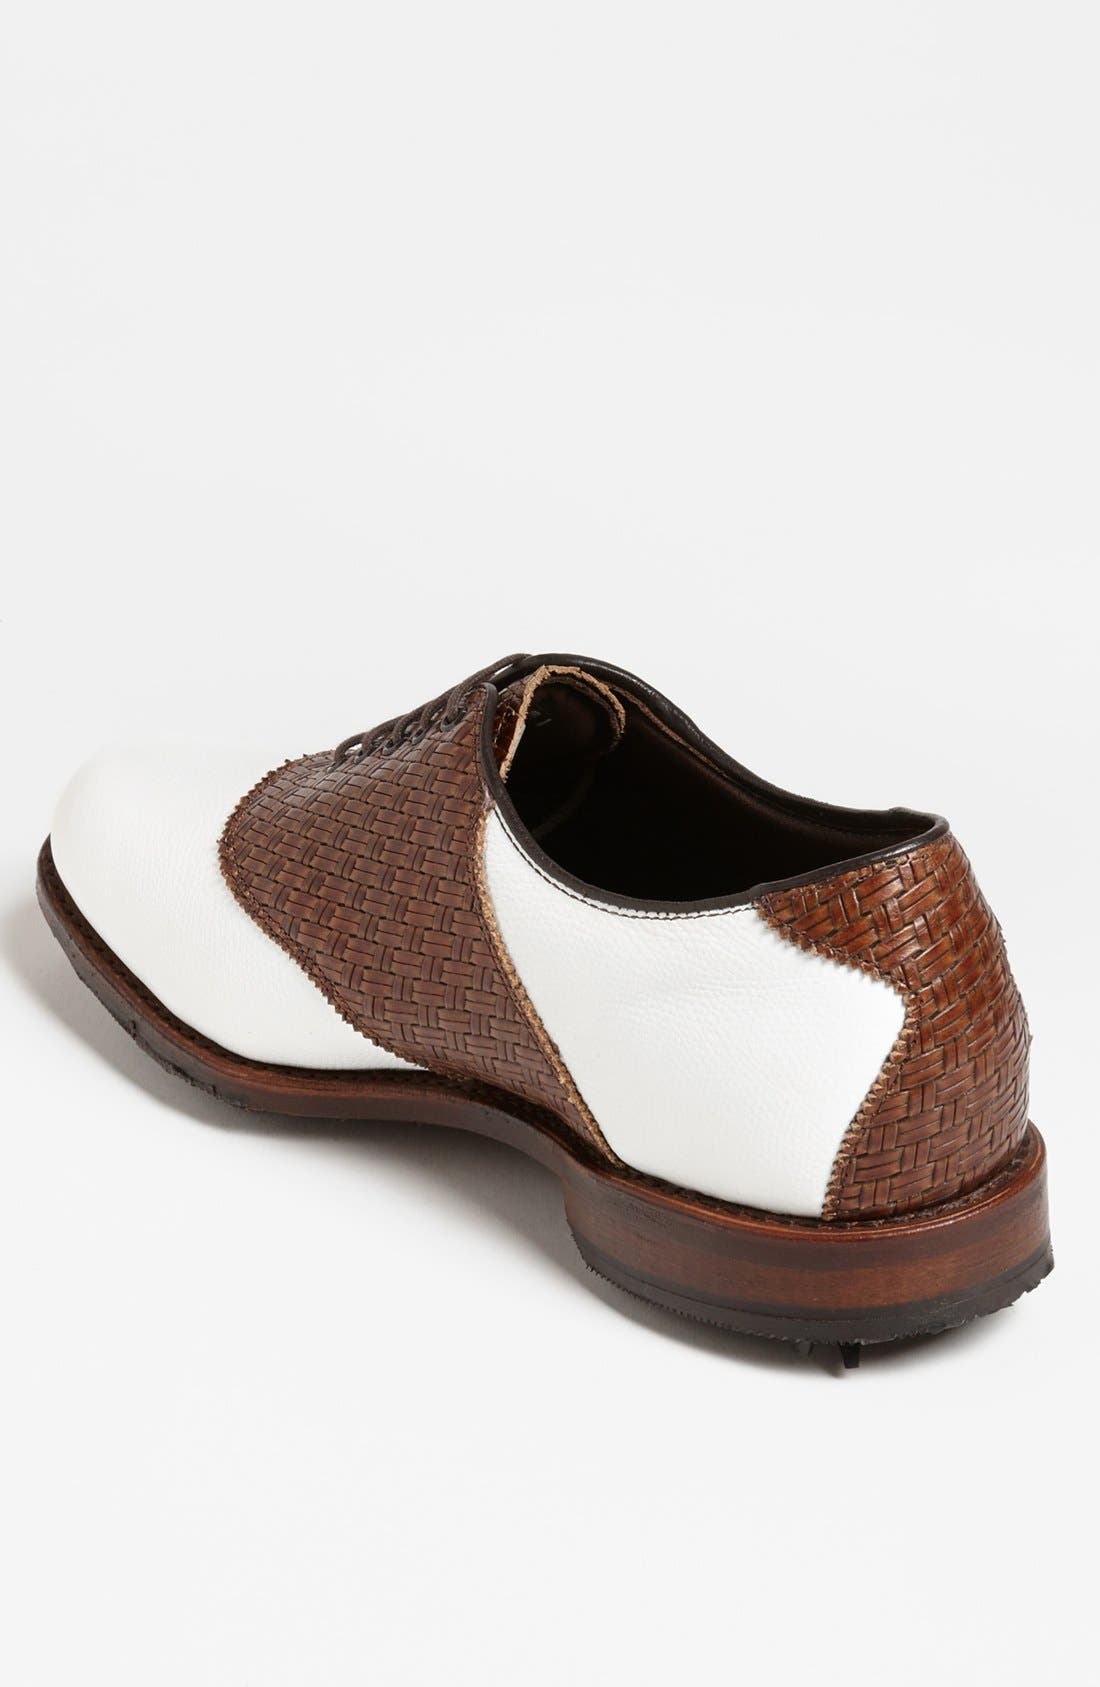 Alternate Image 2  - Allen Edmonds 'Redan' Golf Shoe (Men)